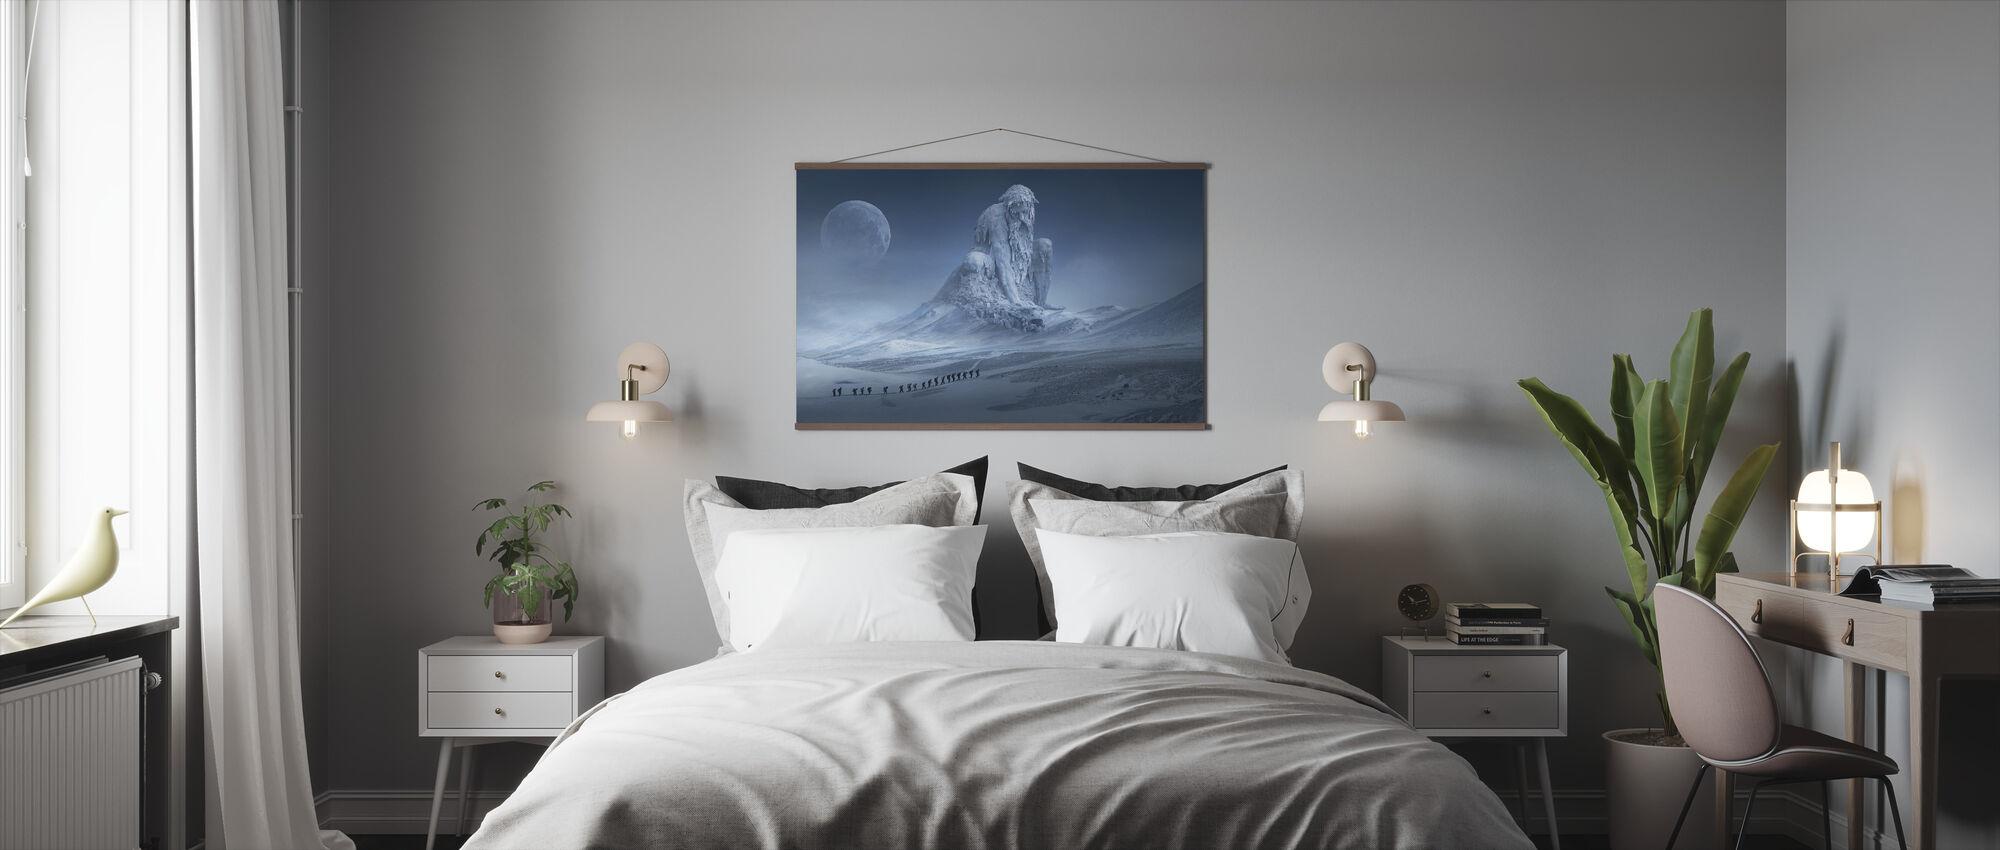 Fantasy Snö Landskap - Poster - Sovrum